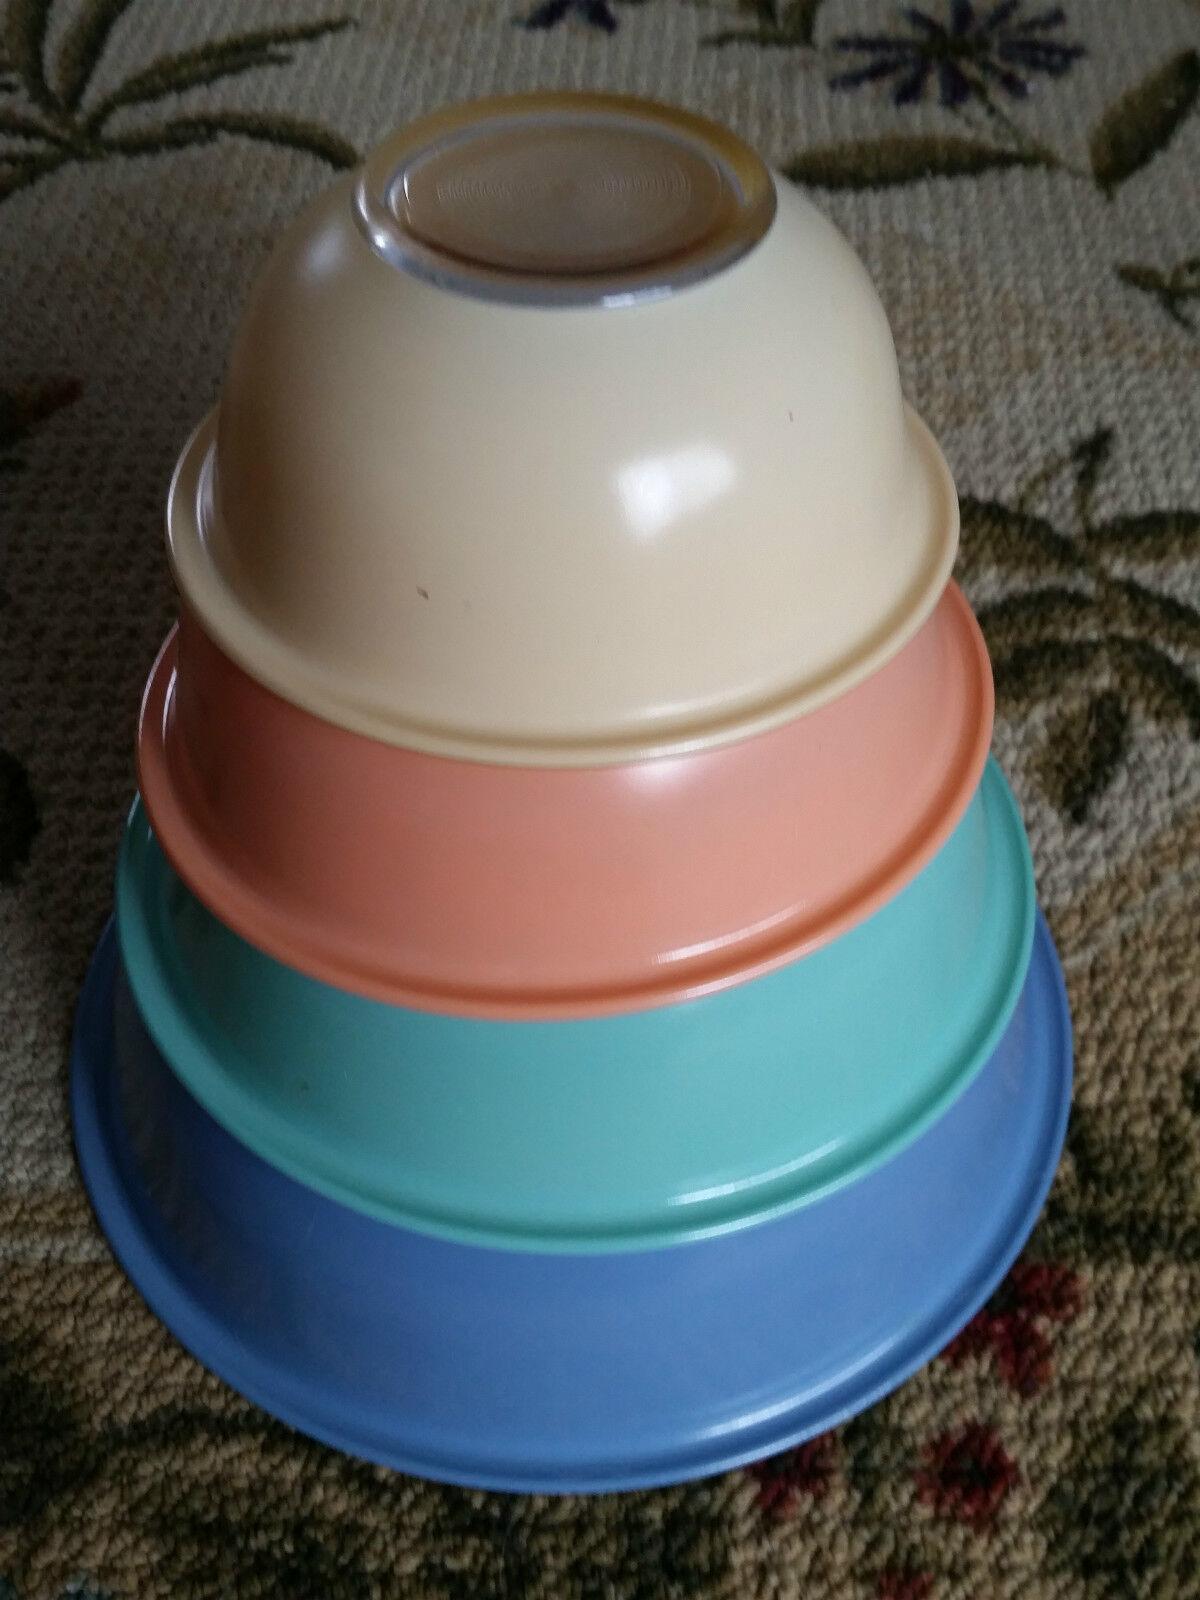 Pyrex Nesting Set of 4 Bowls  0206-186